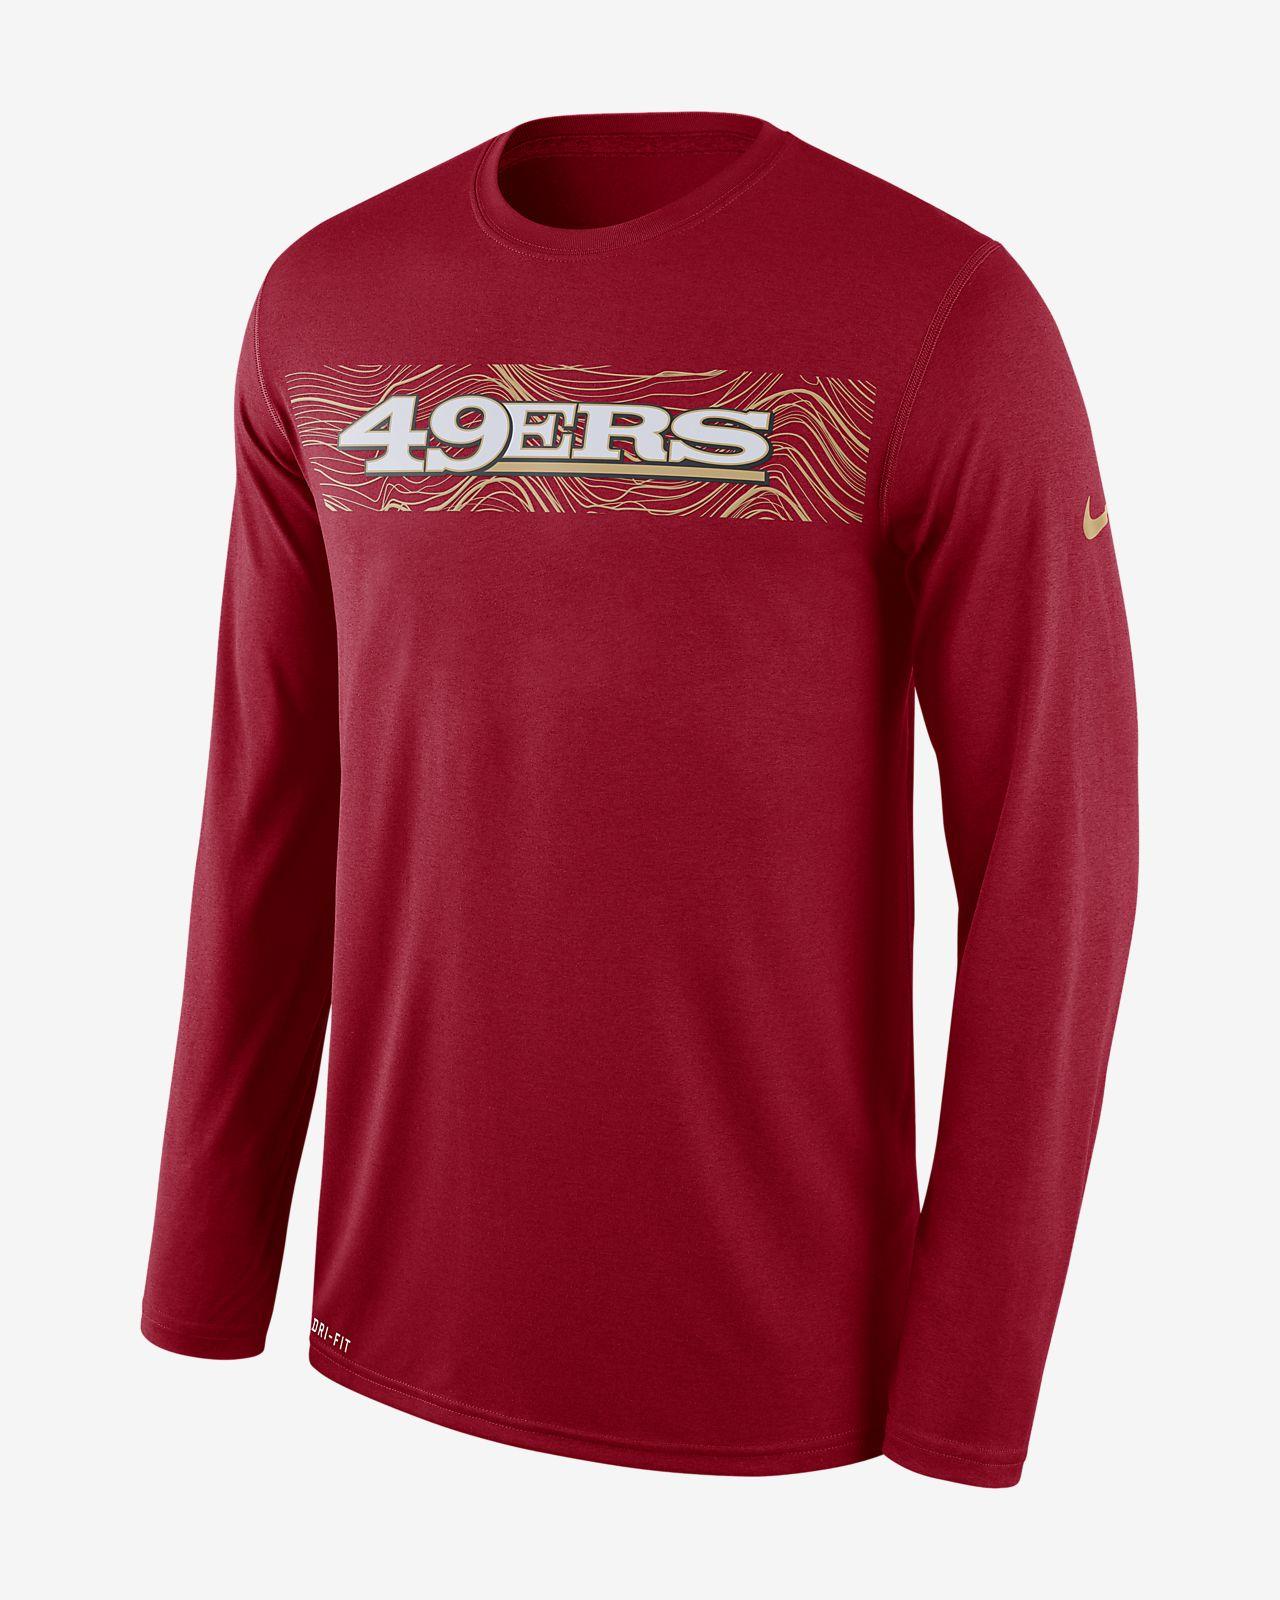 Nike Dri-FIT Legend Seismic (NFL 49ers) Men's Long Sleeve T-Shirt